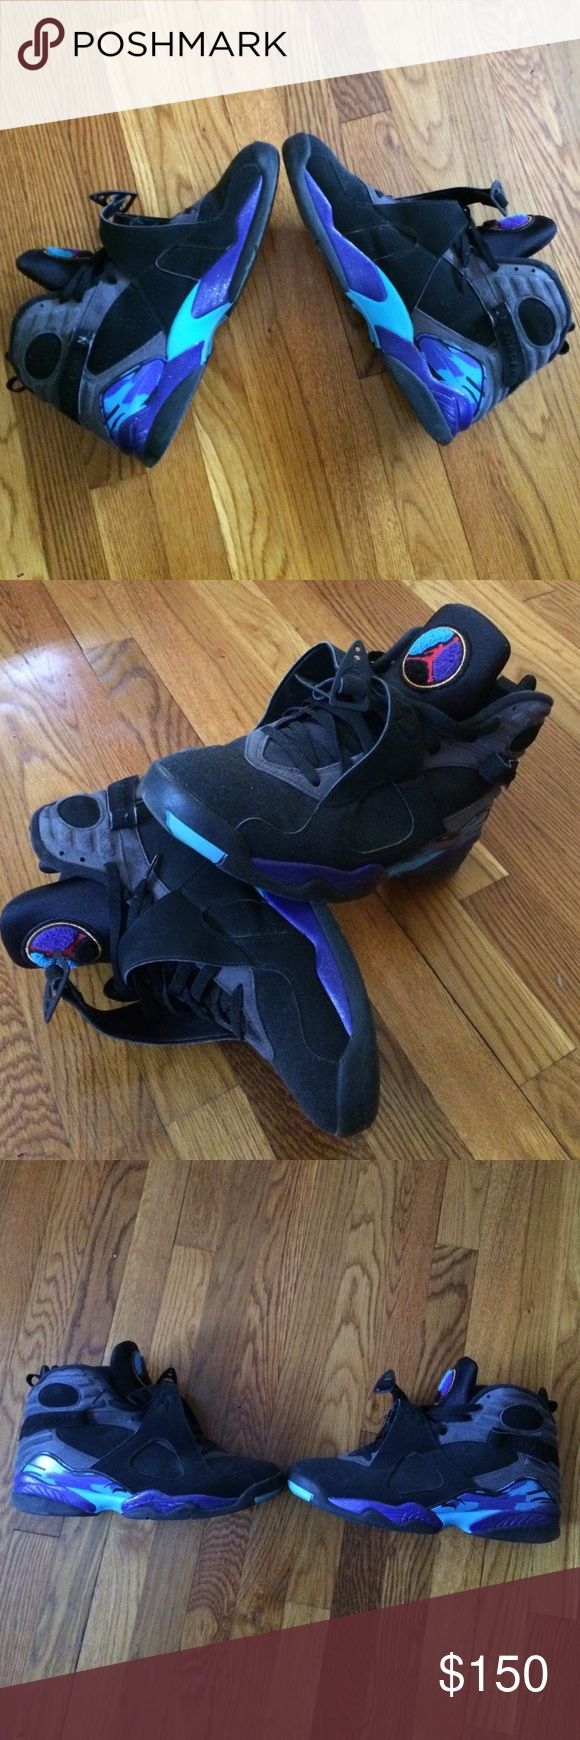 Air Jordan VIII 8 Aquas Retro Air Jordan Retro Size 12 Jordan Shoes Athletic Shoes